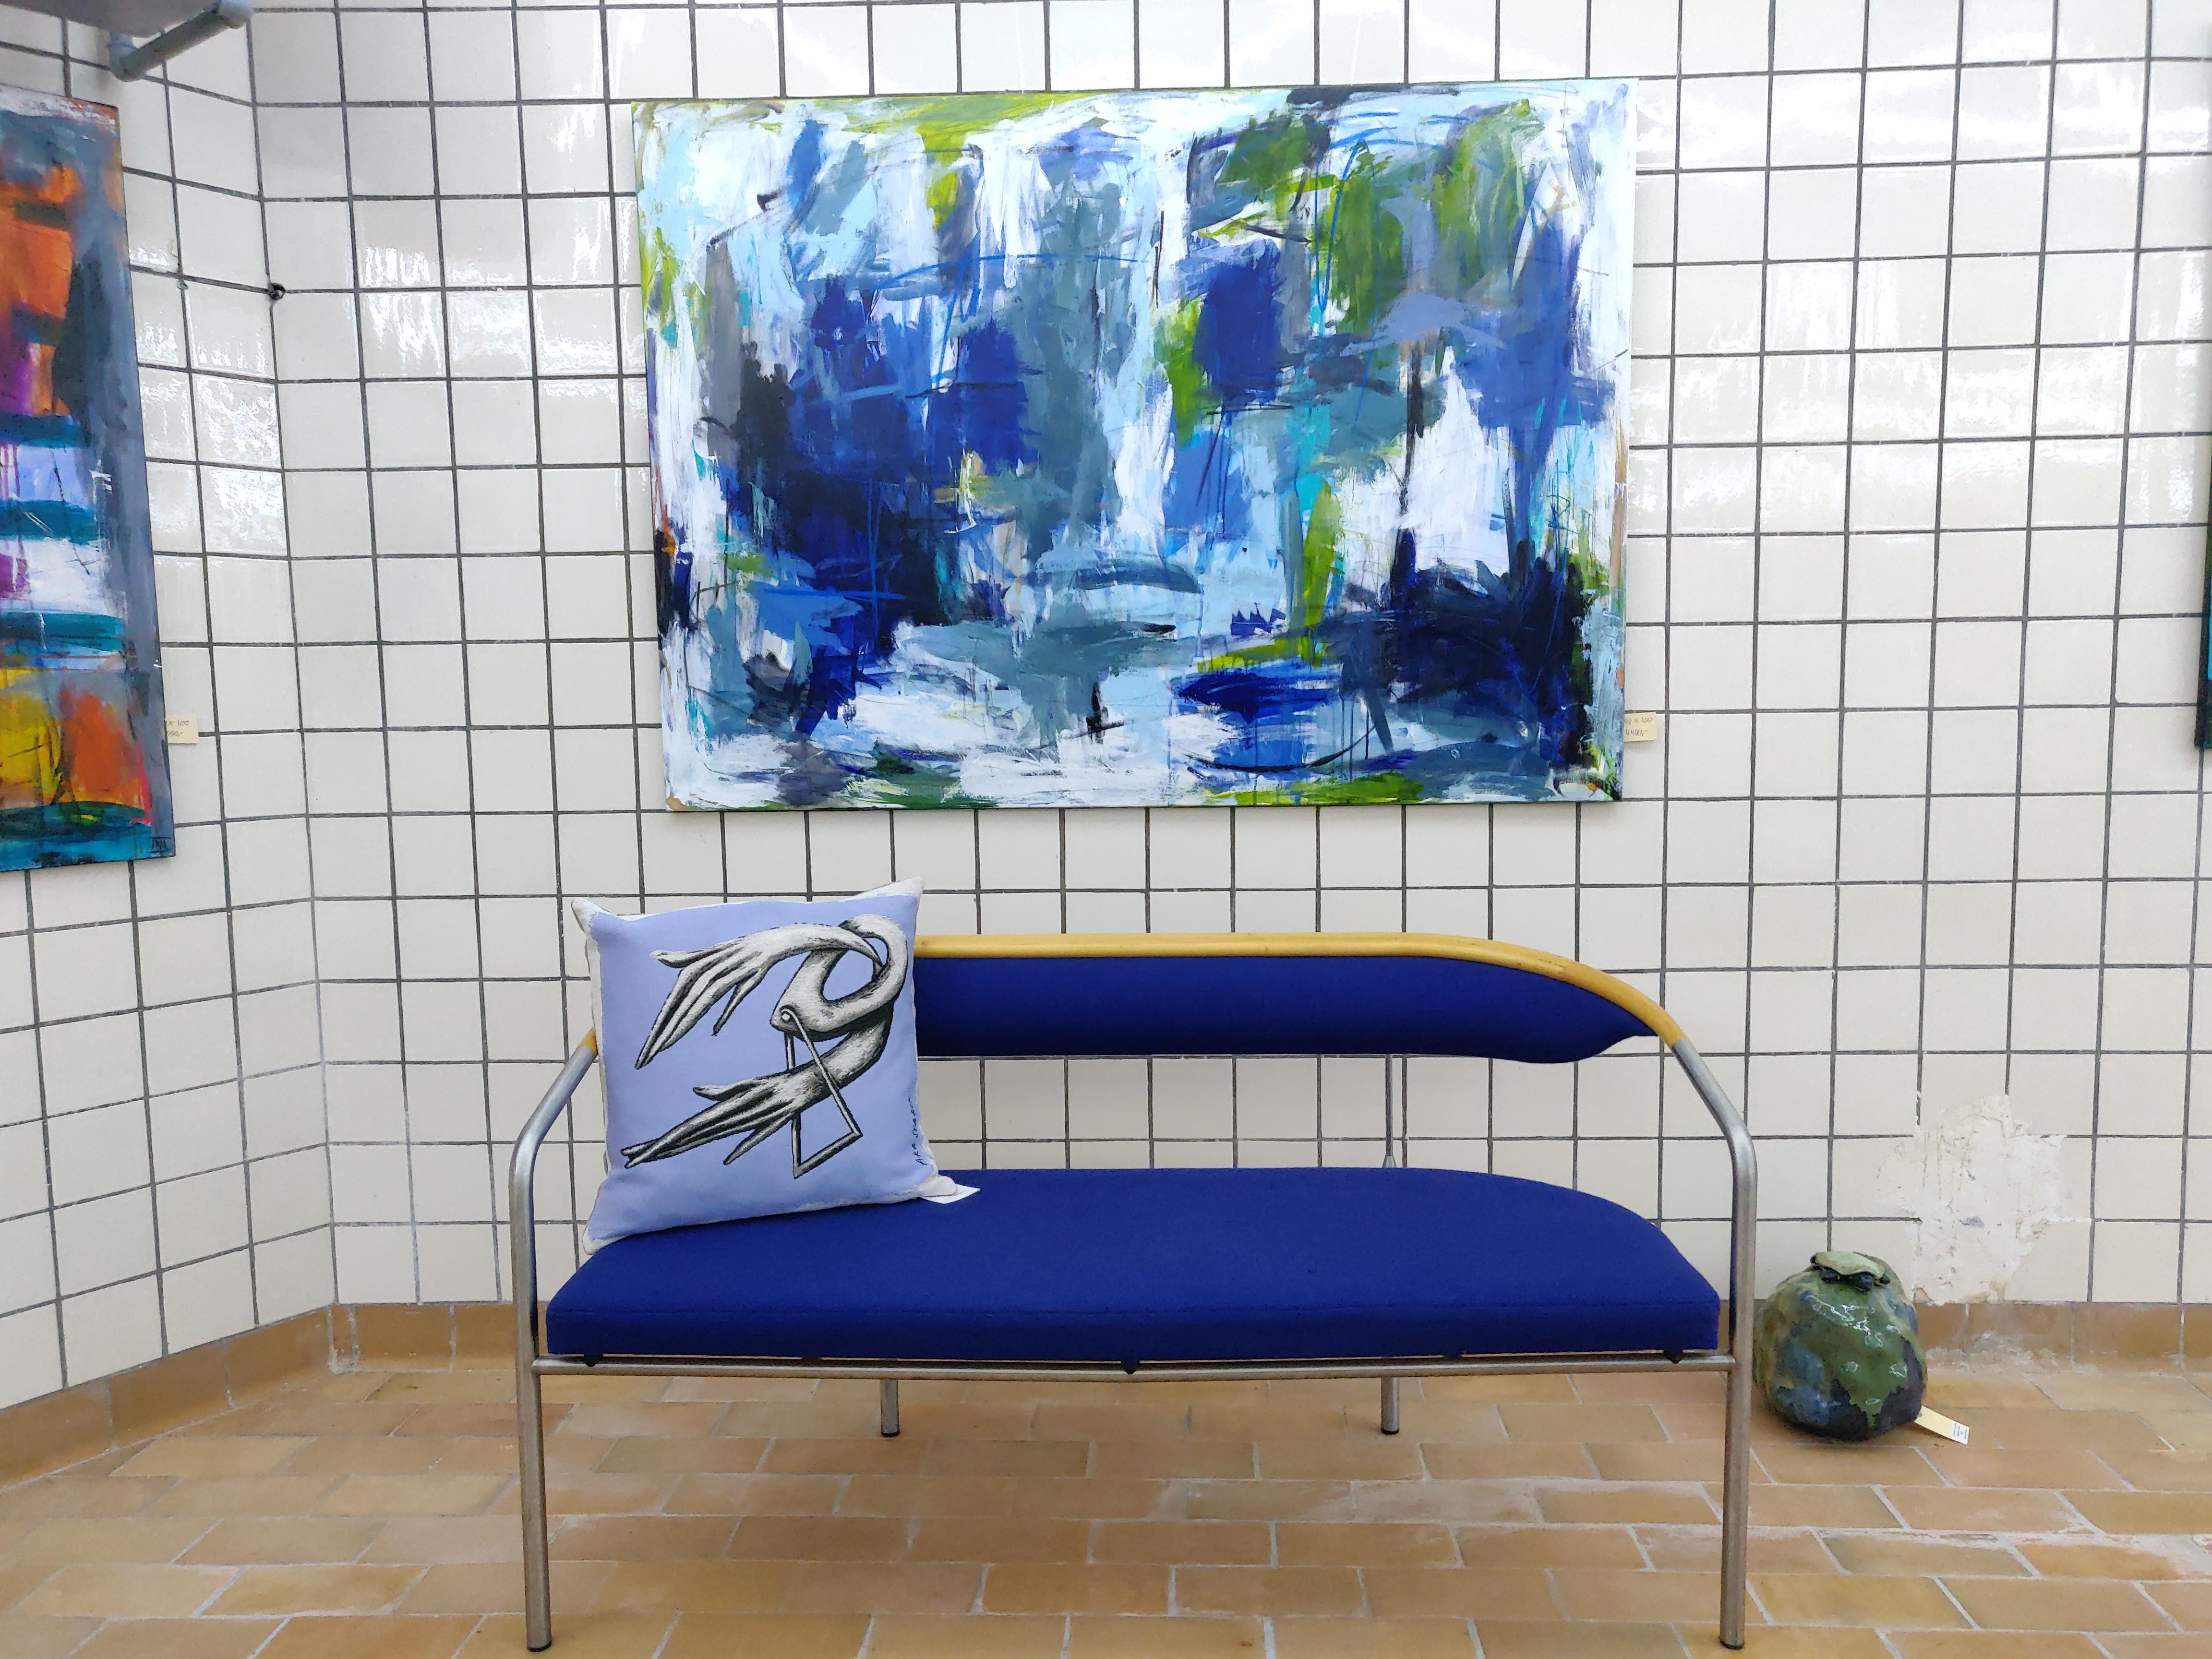 Ina Nielsen Maleri Abstrakt